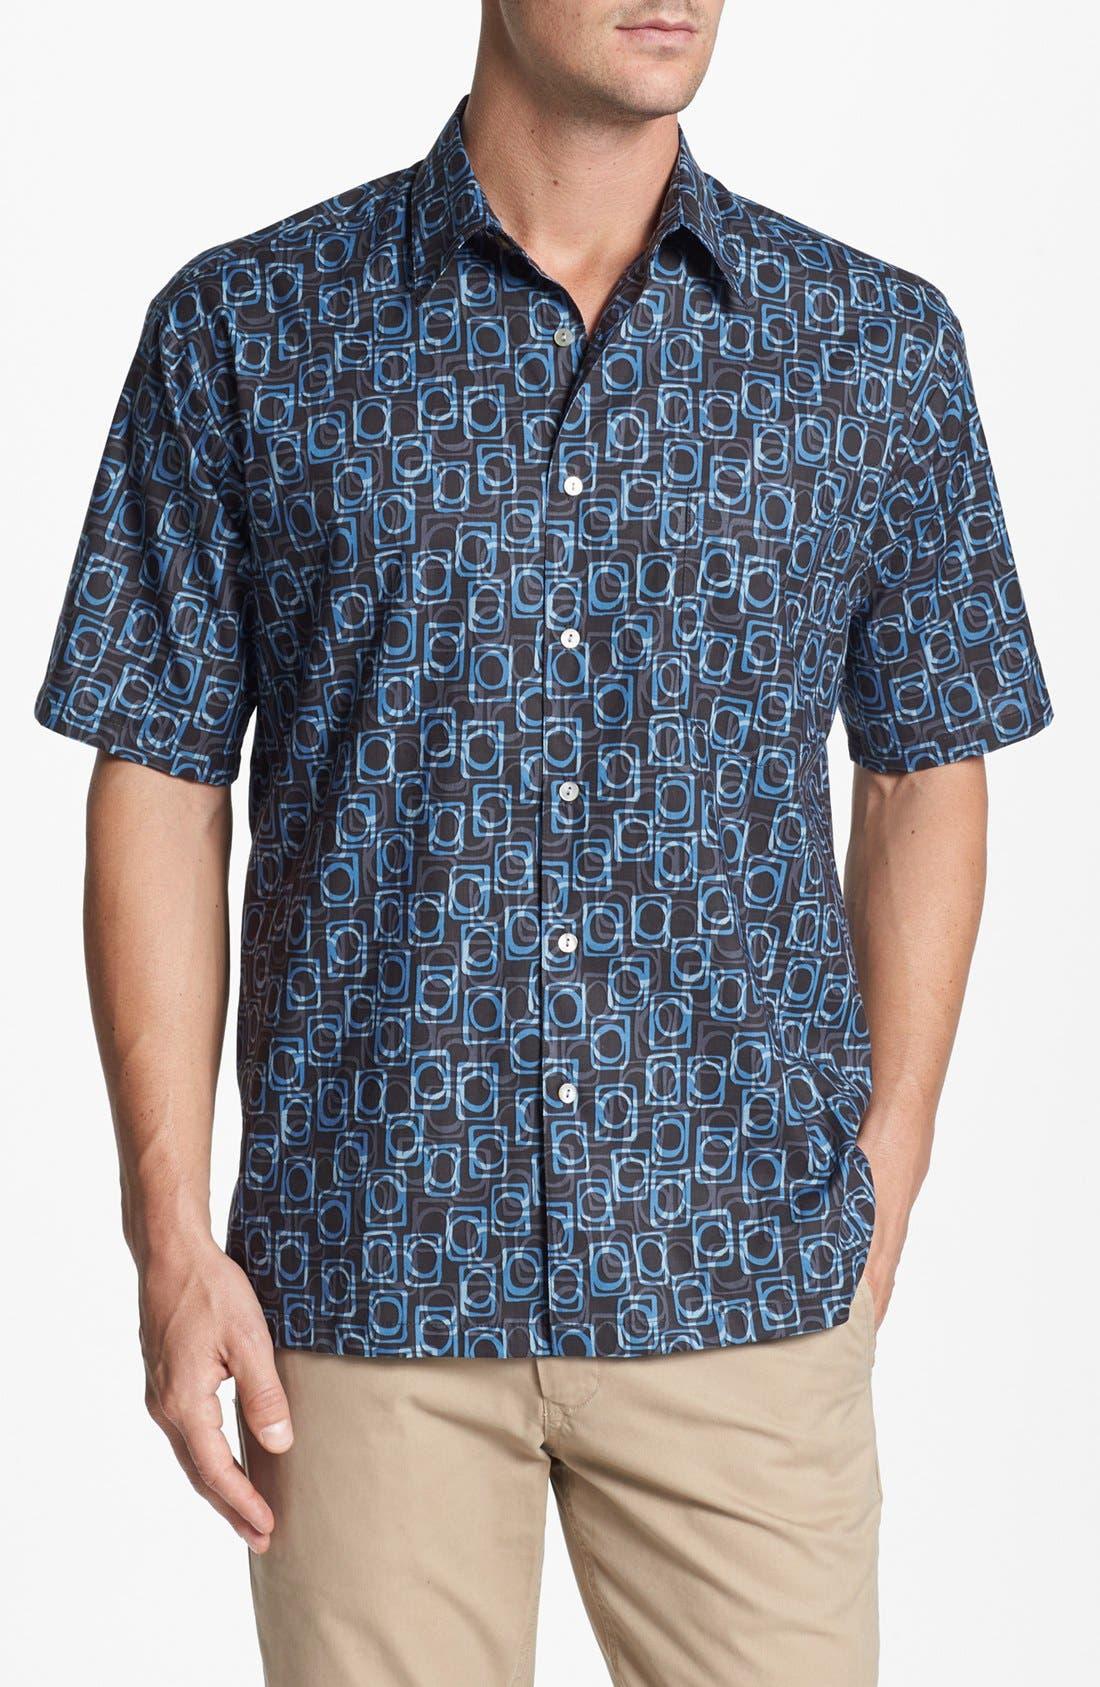 Alternate Image 1 Selected - Tori Richard 'Eclipse' Cotton Lawn Campshirt